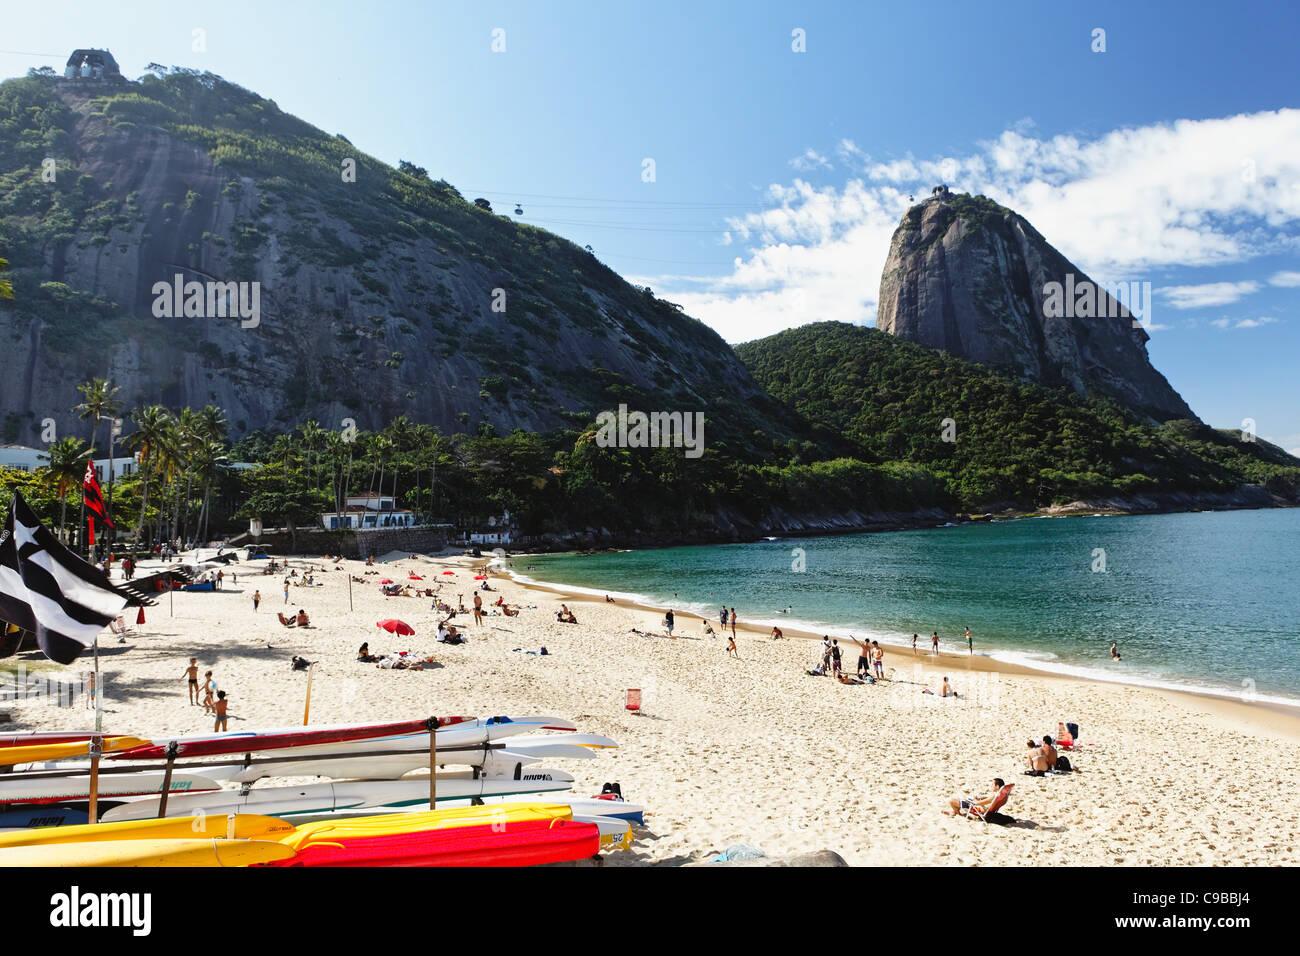 Vista de Sugarloaf Mountain desde Playa Vermelha, Río de Janeiro, Brasil Imagen De Stock